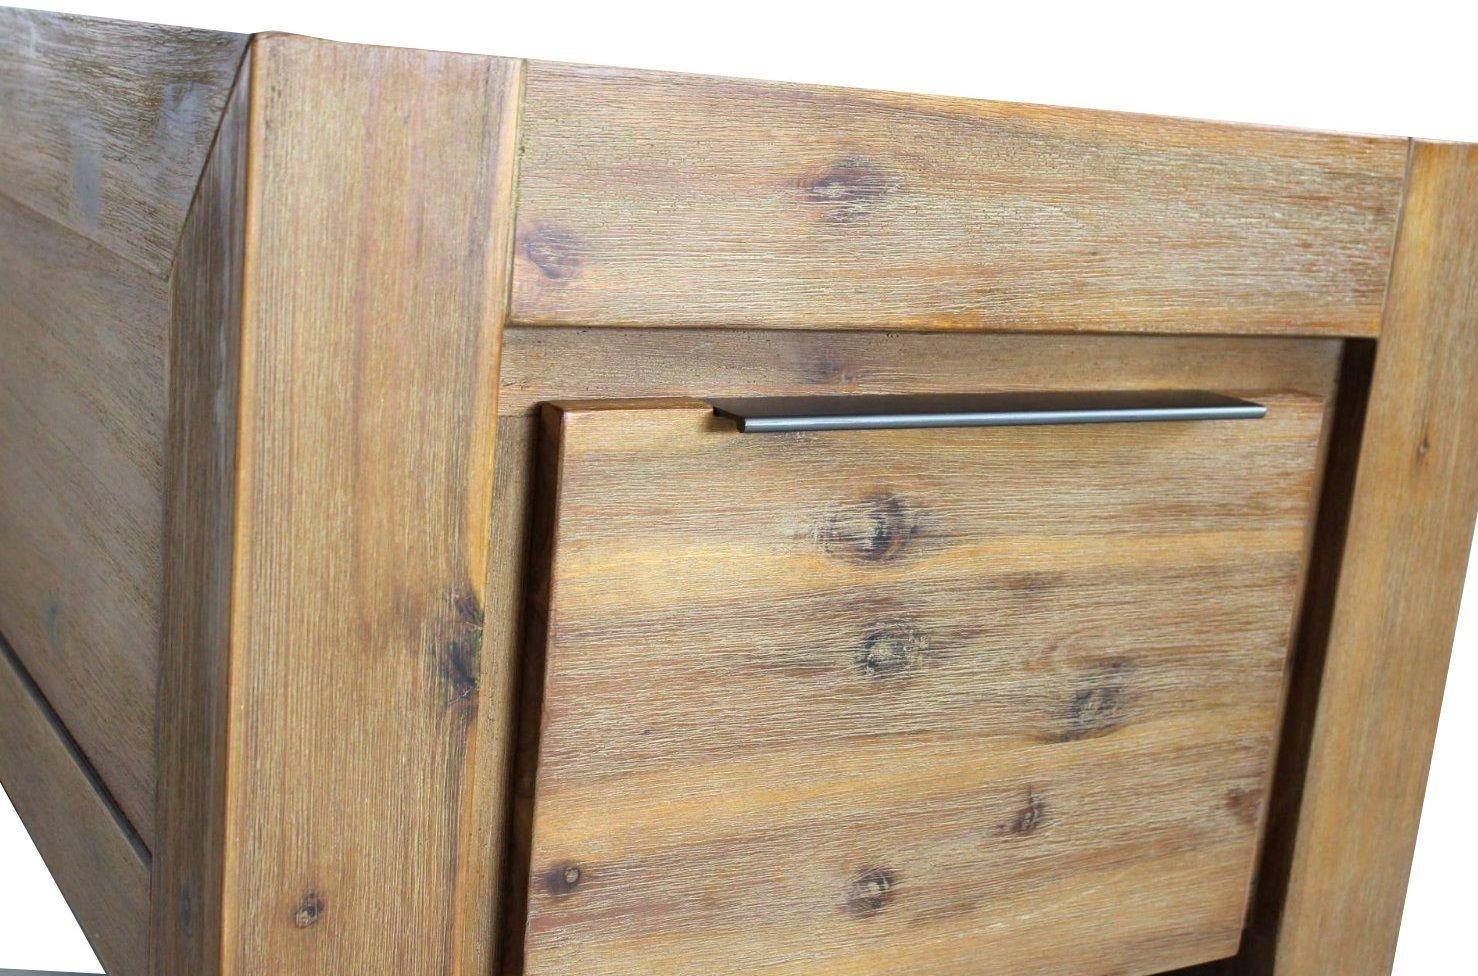 kche akazie hcker u kche boston akazie grau with kche akazie affordable pino kuchen wotzccom. Black Bedroom Furniture Sets. Home Design Ideas